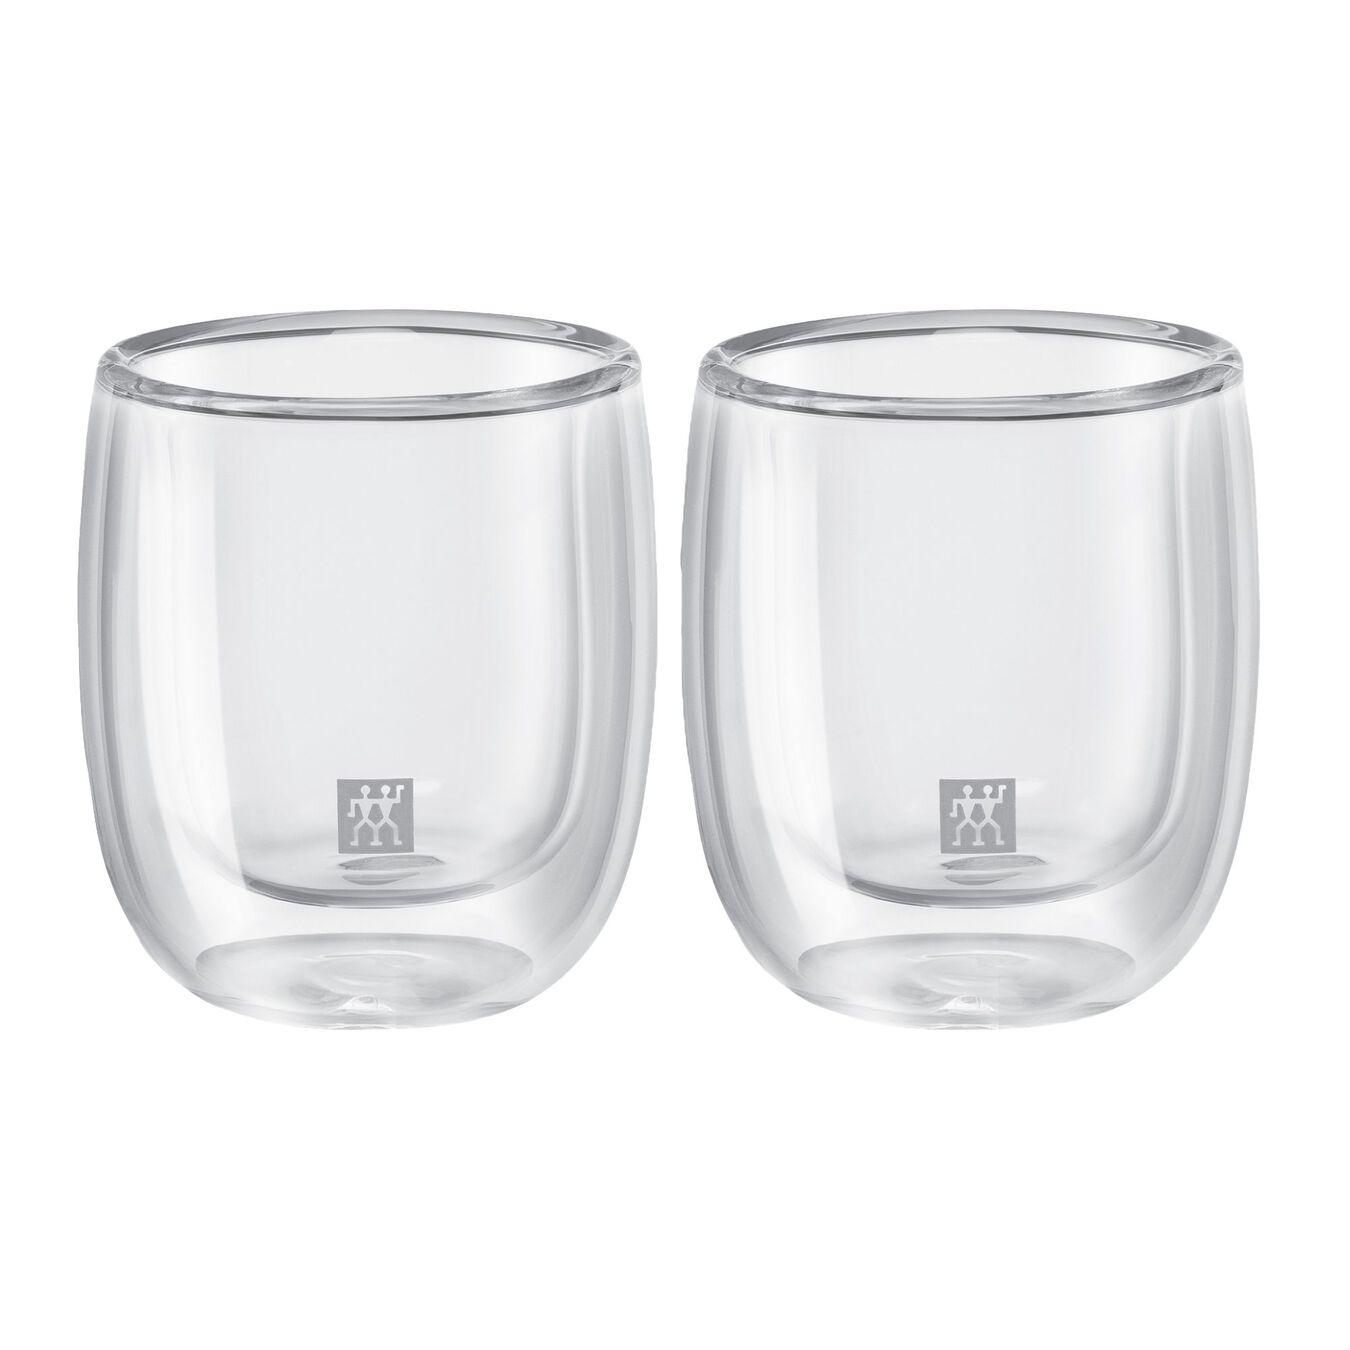 Espresso Bardağı Seti | Cam | 2-adet,,large 1